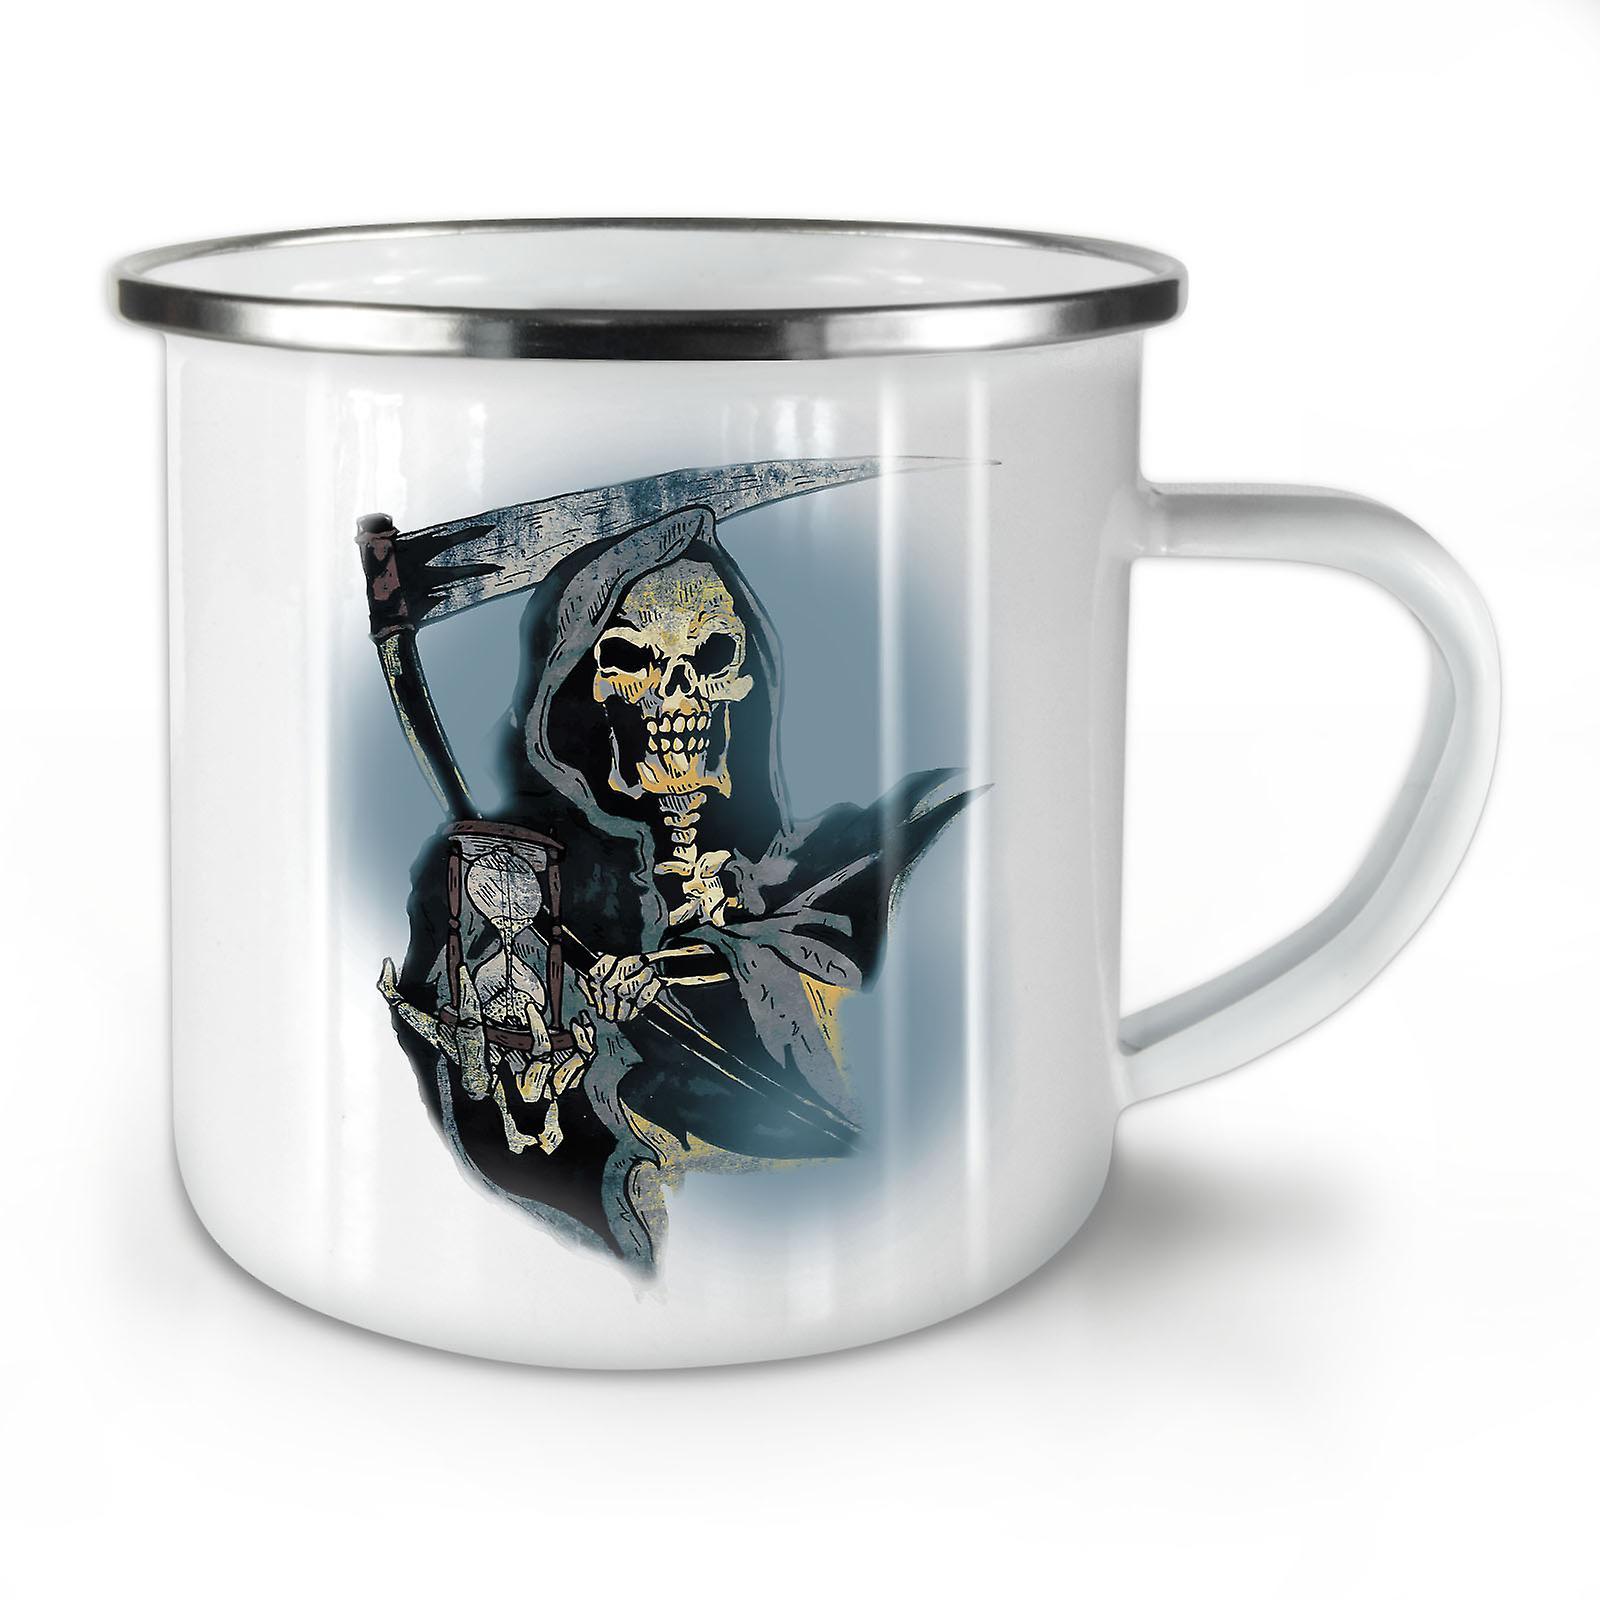 Skull Mort Nouveau Whitetea Émail Café Mug10 Temps Reaper OzWellcoda c3lFTK1uJ5